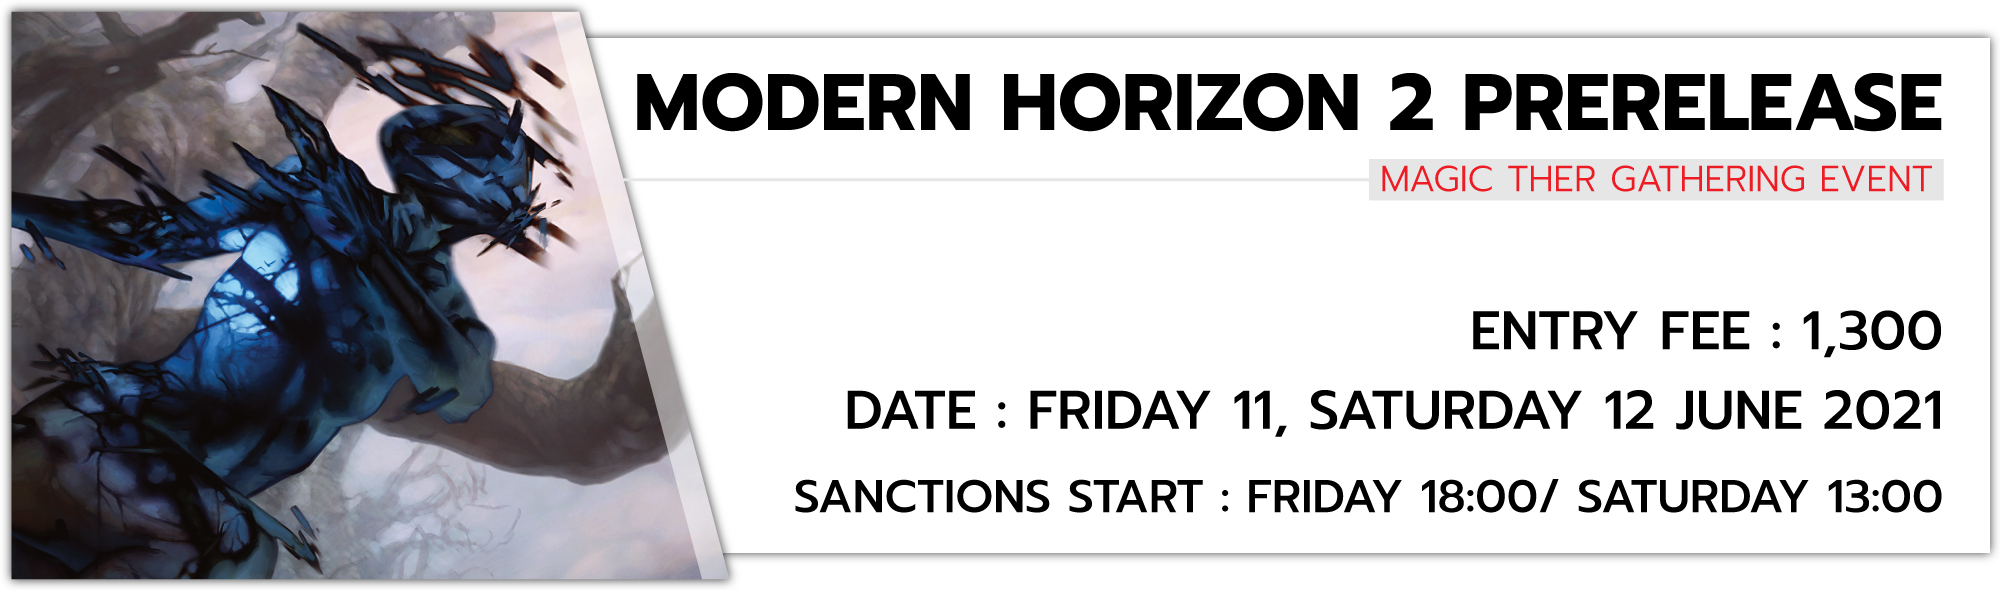 Modern Horizon 2 Prerelease